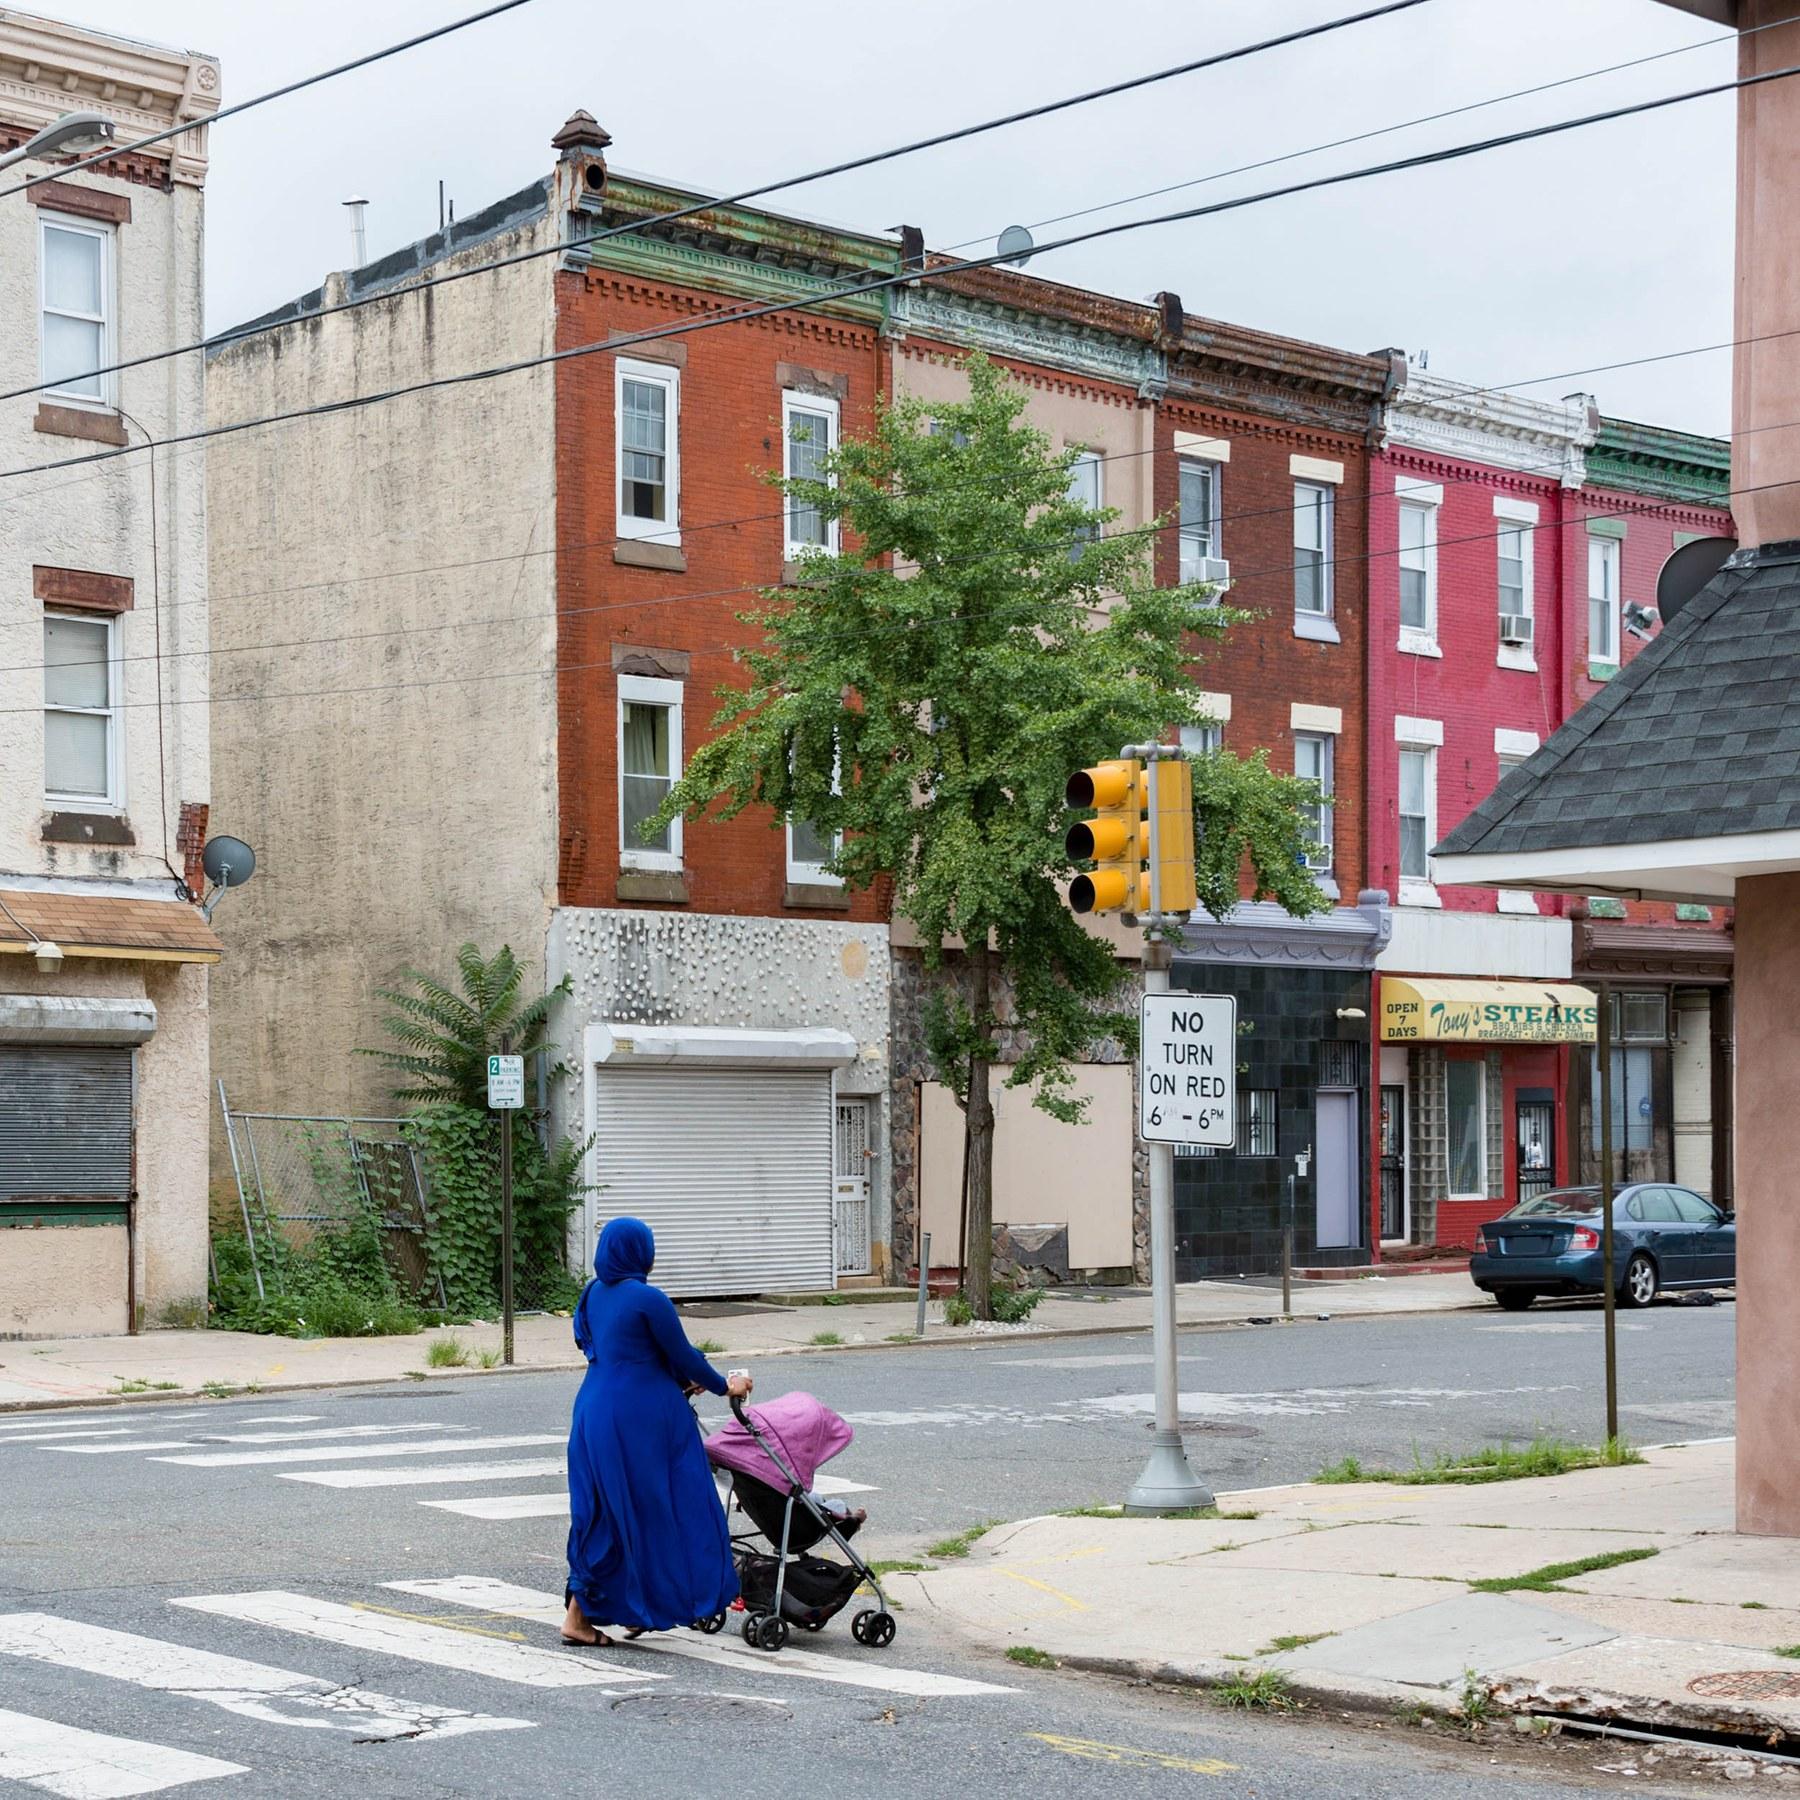 Local Com Homes For Rent: Stanton, Philadelphia PA - Neighborhood Guide